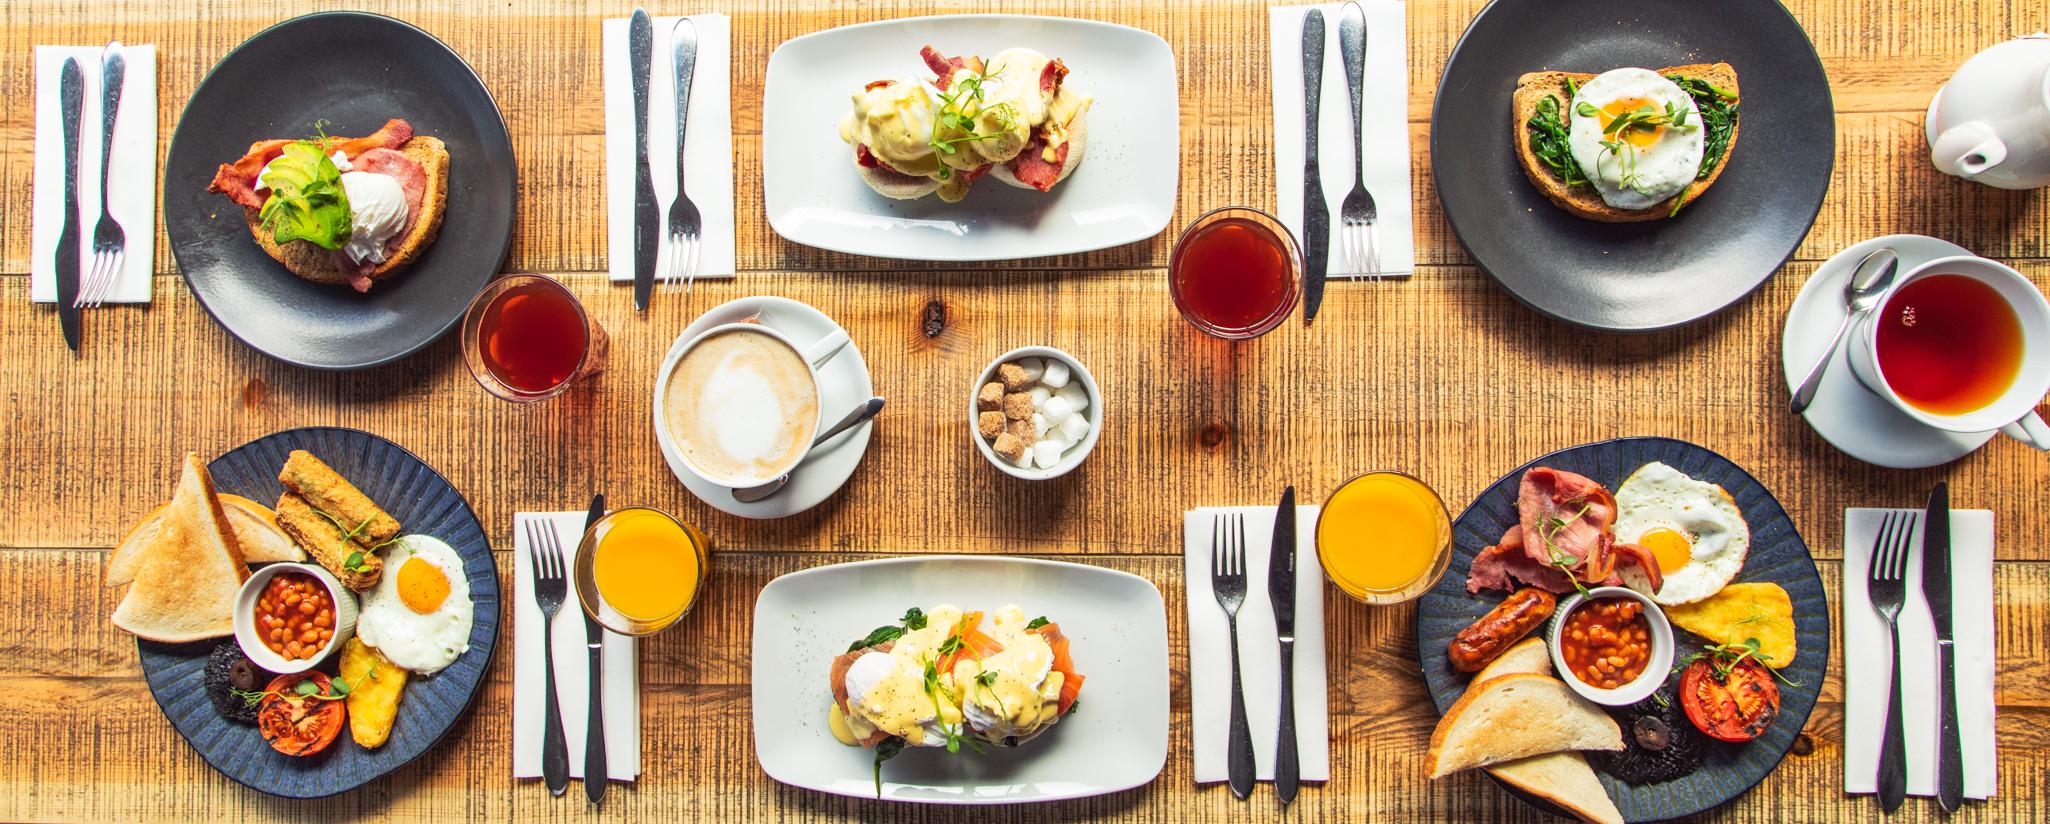 Breakfast in the morning